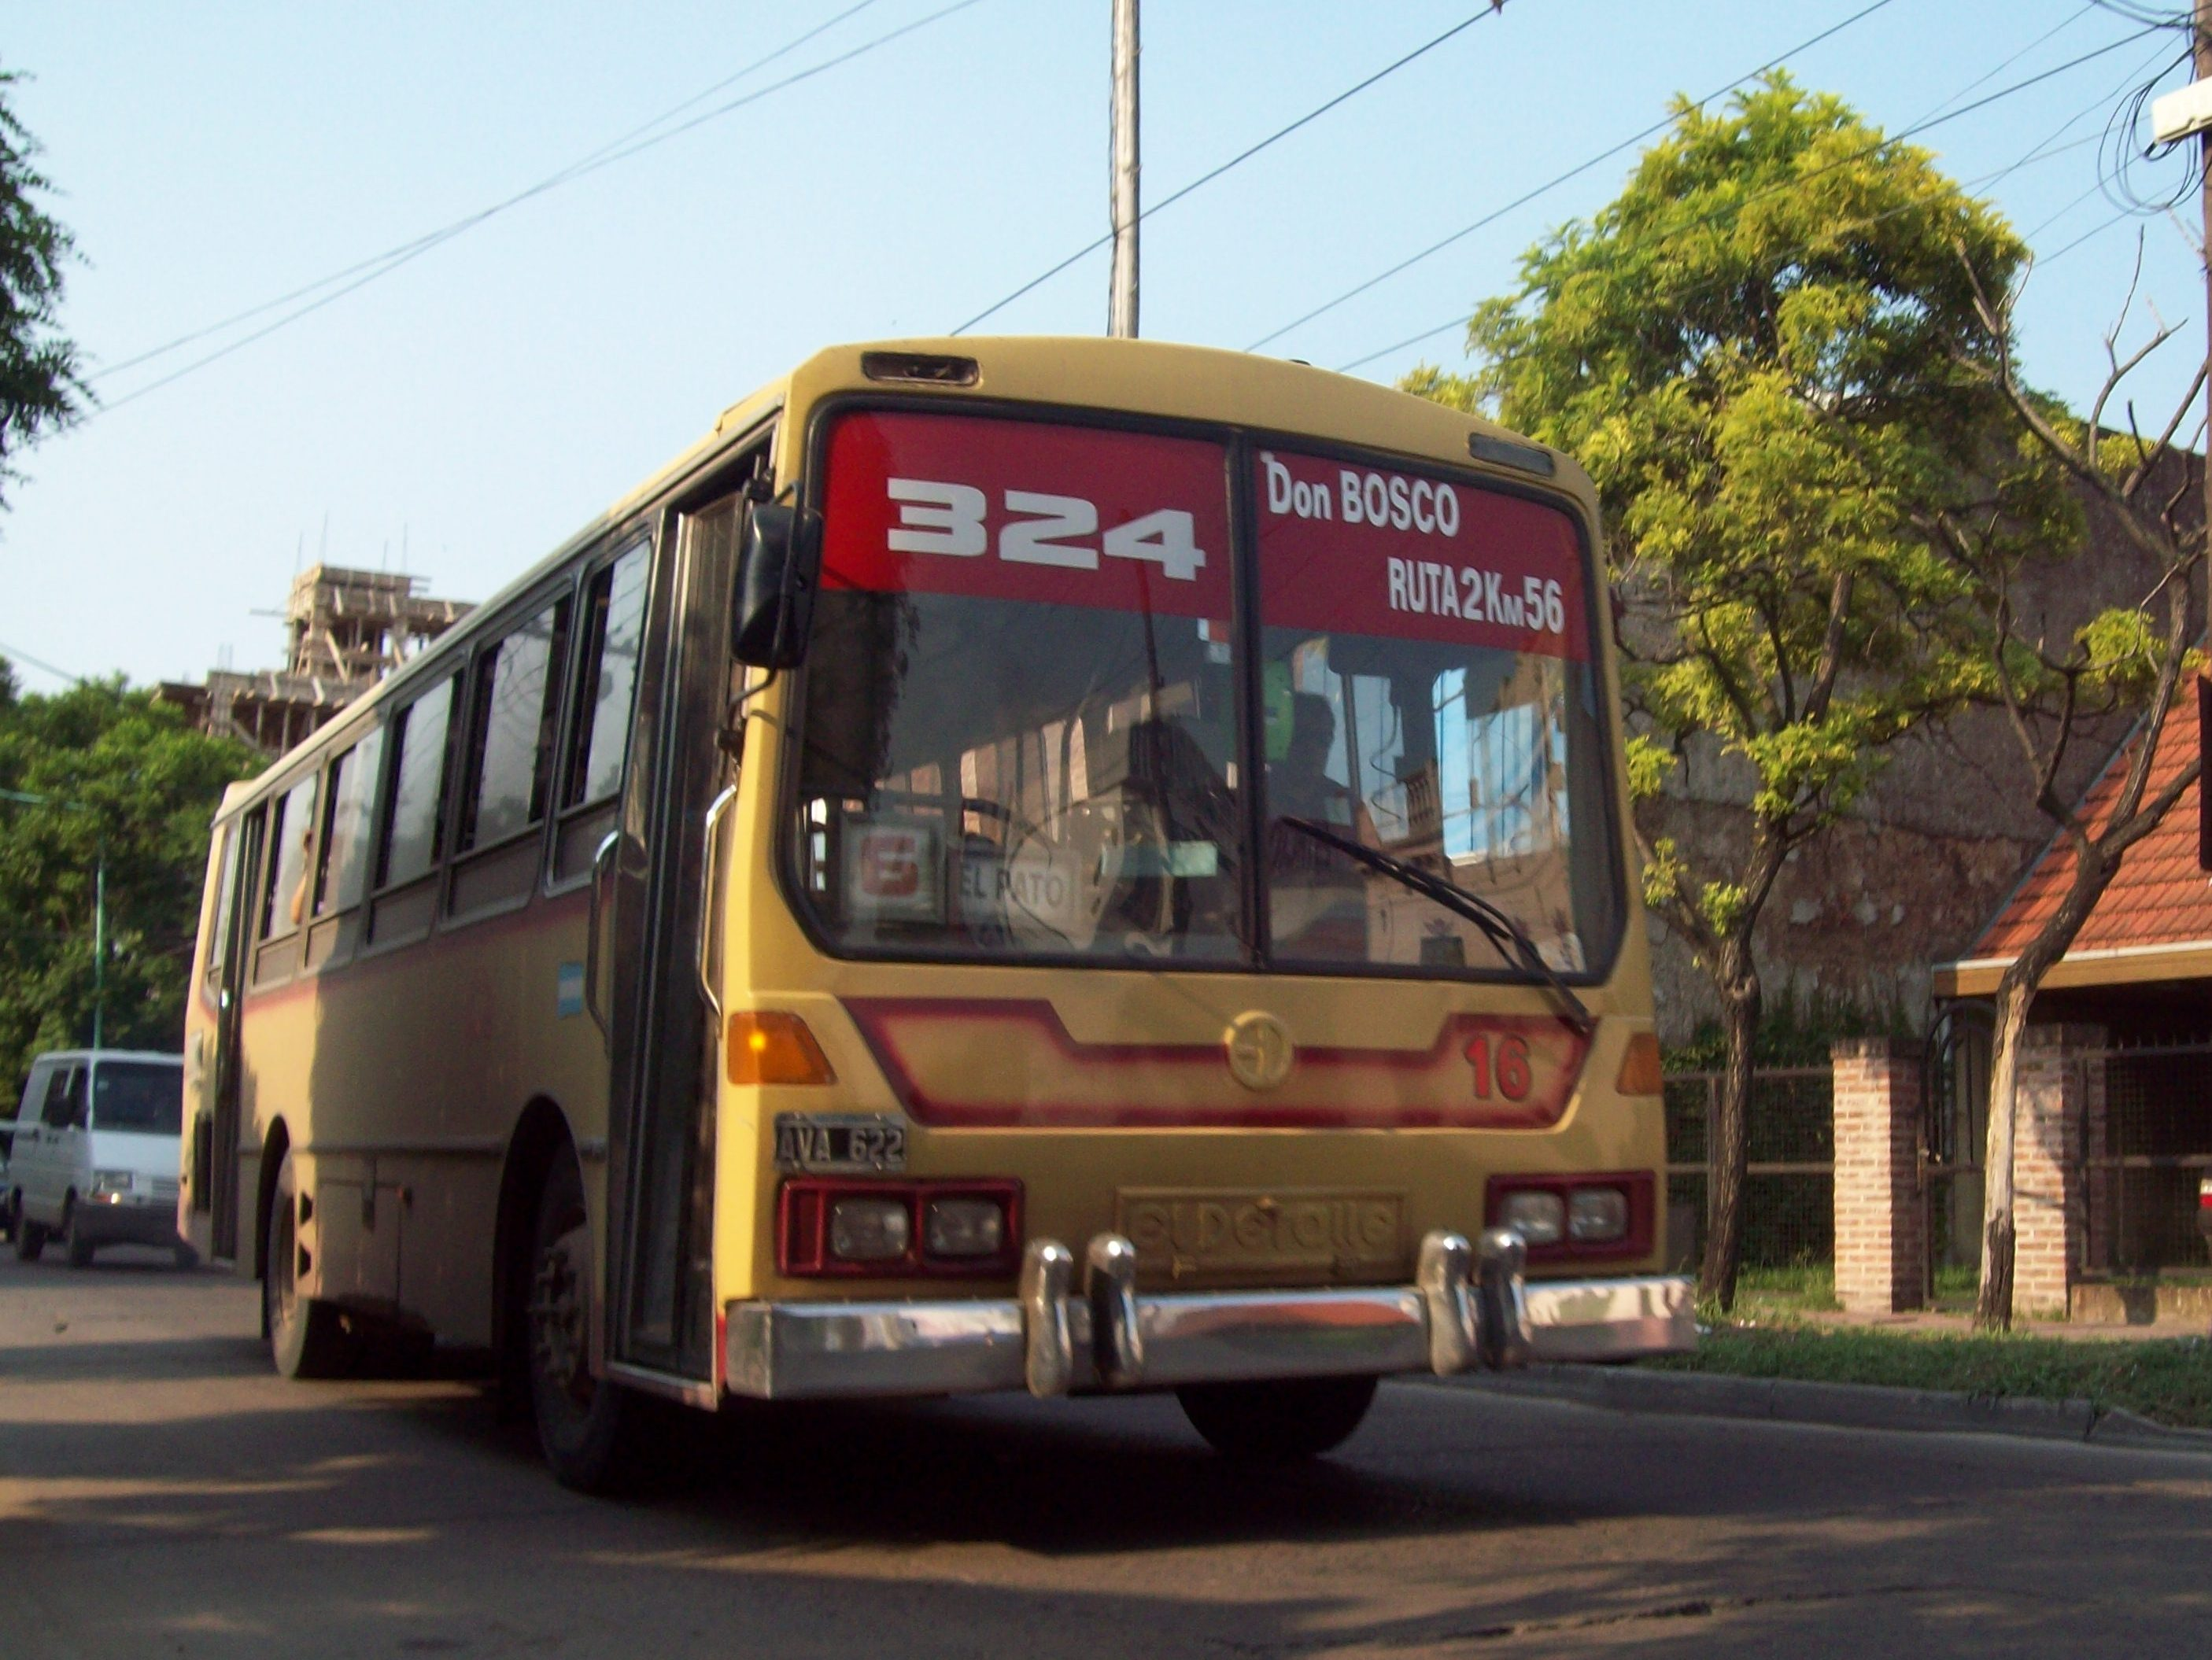 File:Línea 324 en Florencio Varela.JPG